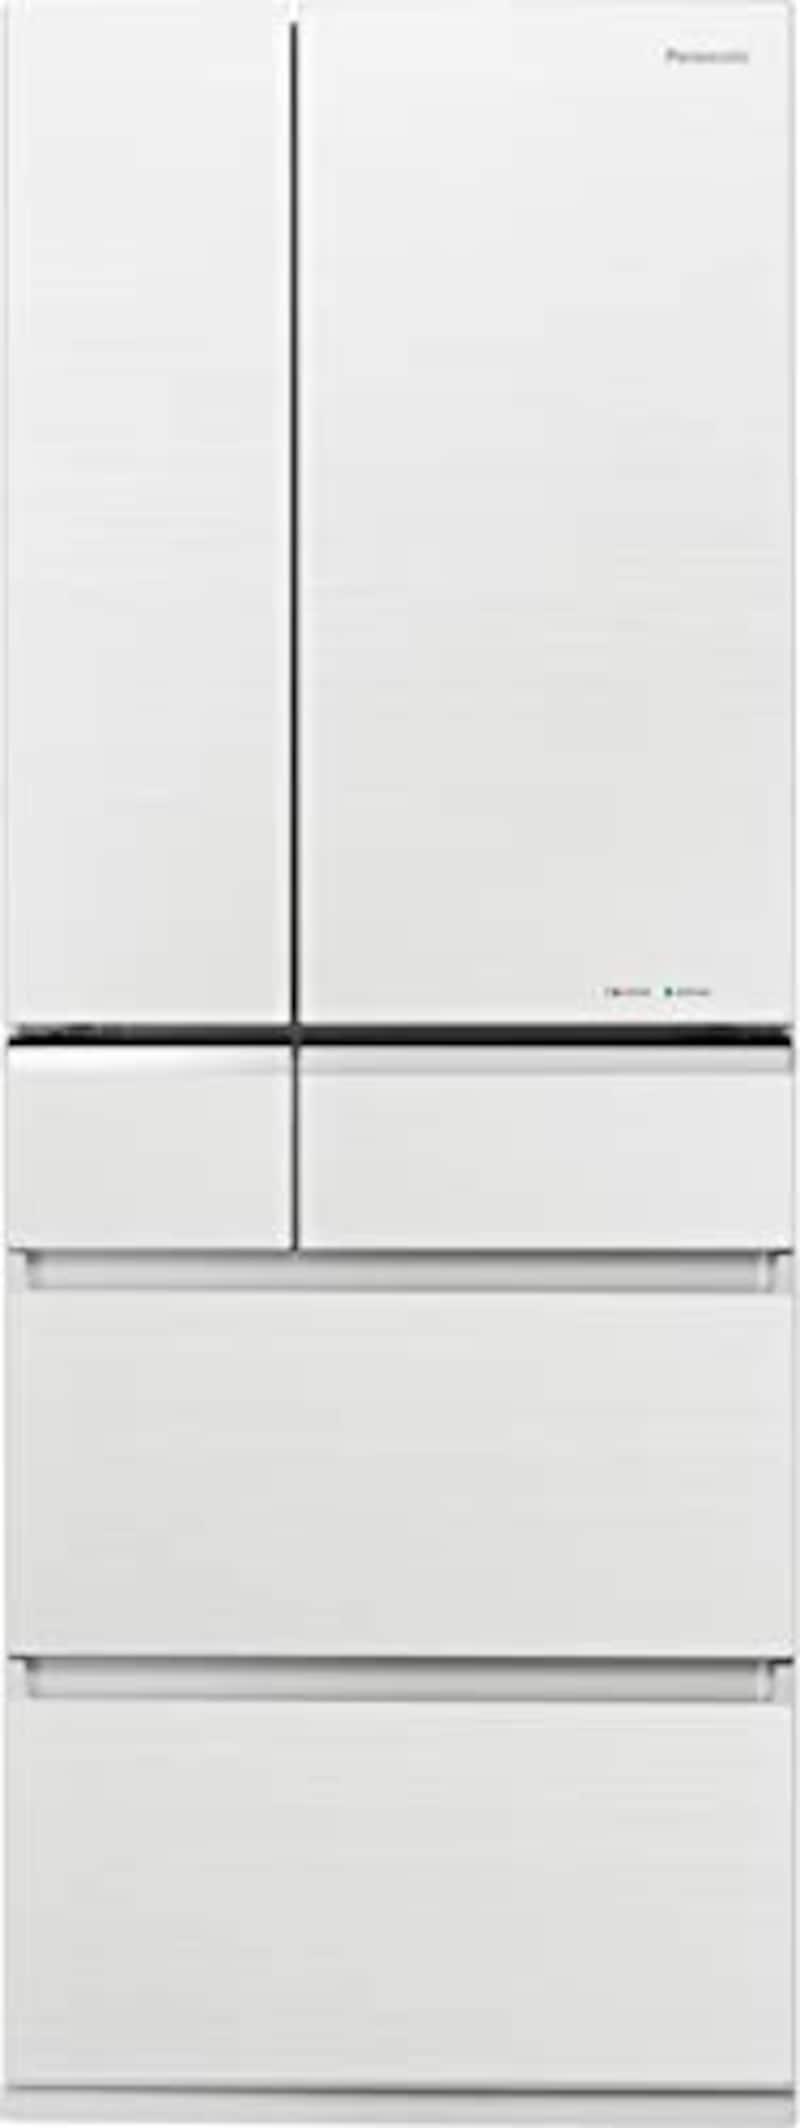 Panasonic(パナソニック),冷蔵庫,NR-F506XPV